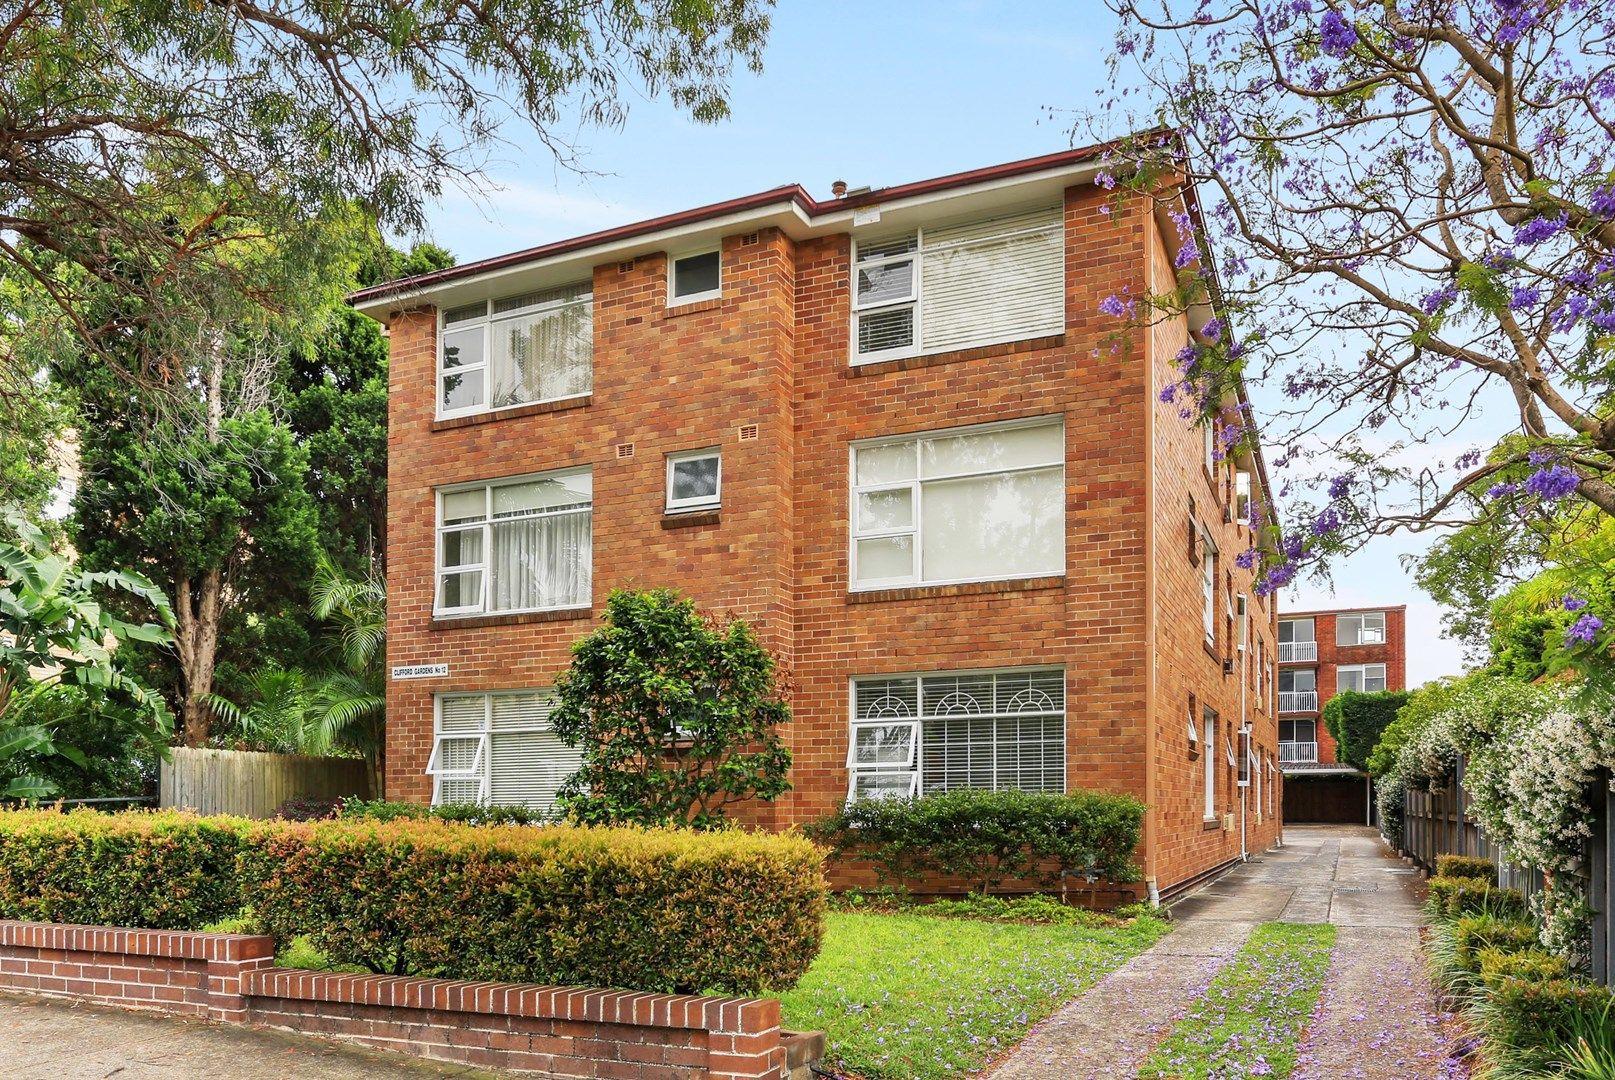 4/12 Clifford Street, Mosman NSW 2088, Image 0